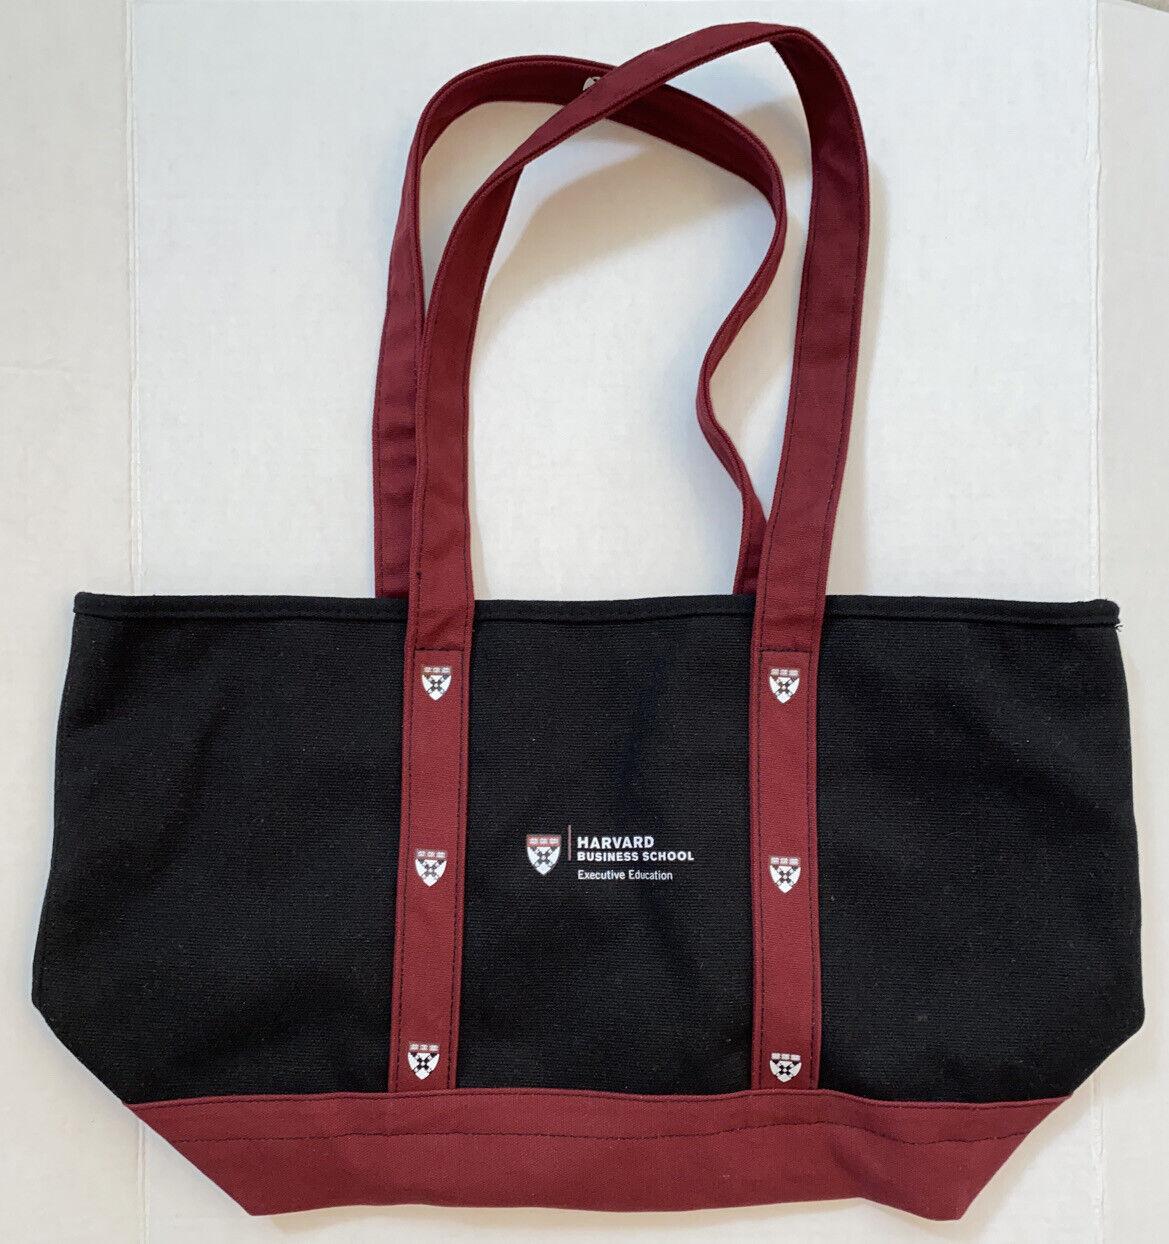 "Harvard Business School Canvas Tote Bag 13"" x 7"" x 21"" 2"